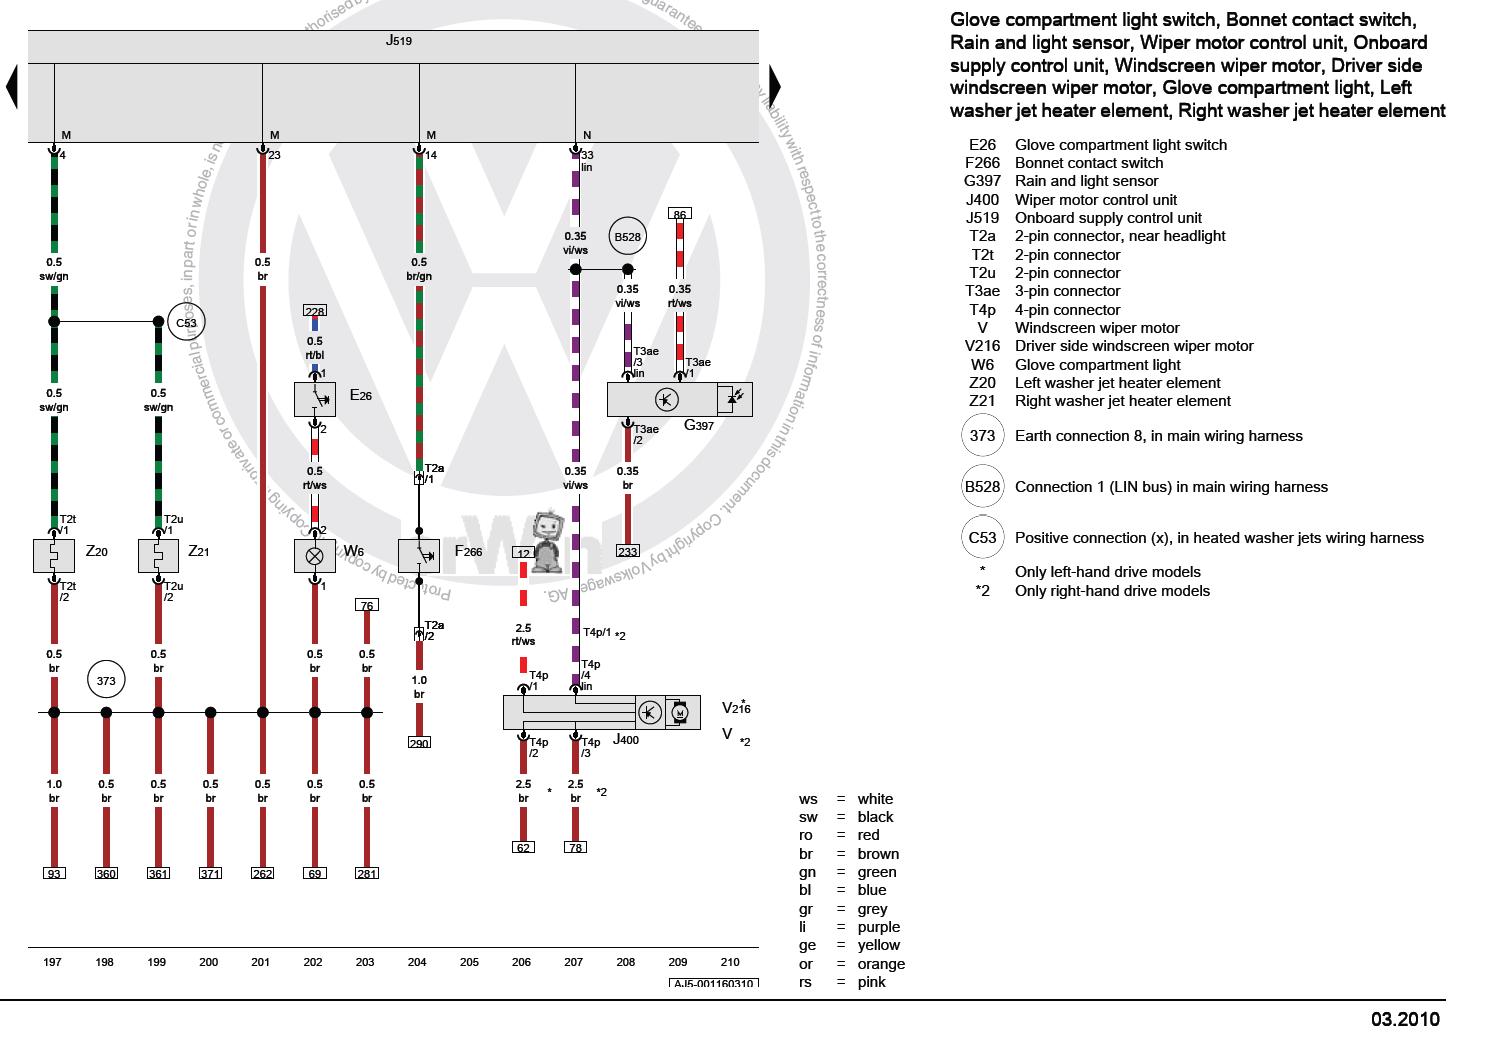 2006 Vw Jetta Stereo Wiring Diagram